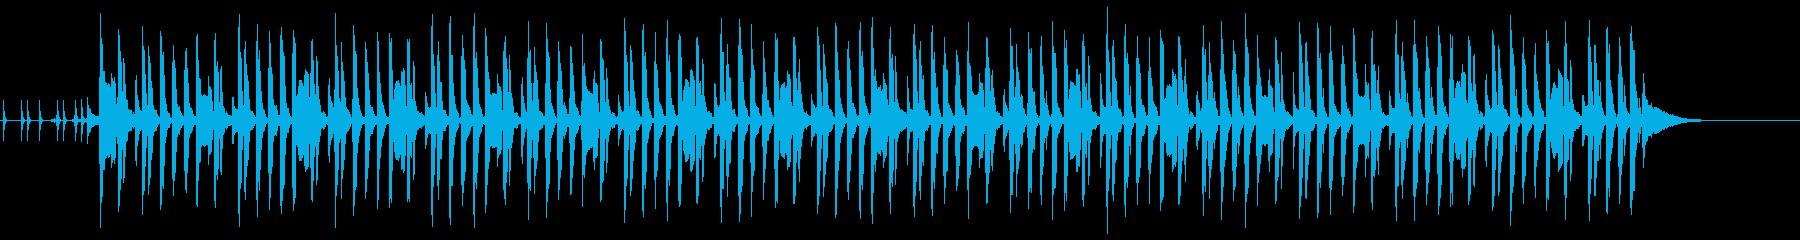 k-POP、洋楽、ヒップホップ、 cの再生済みの波形